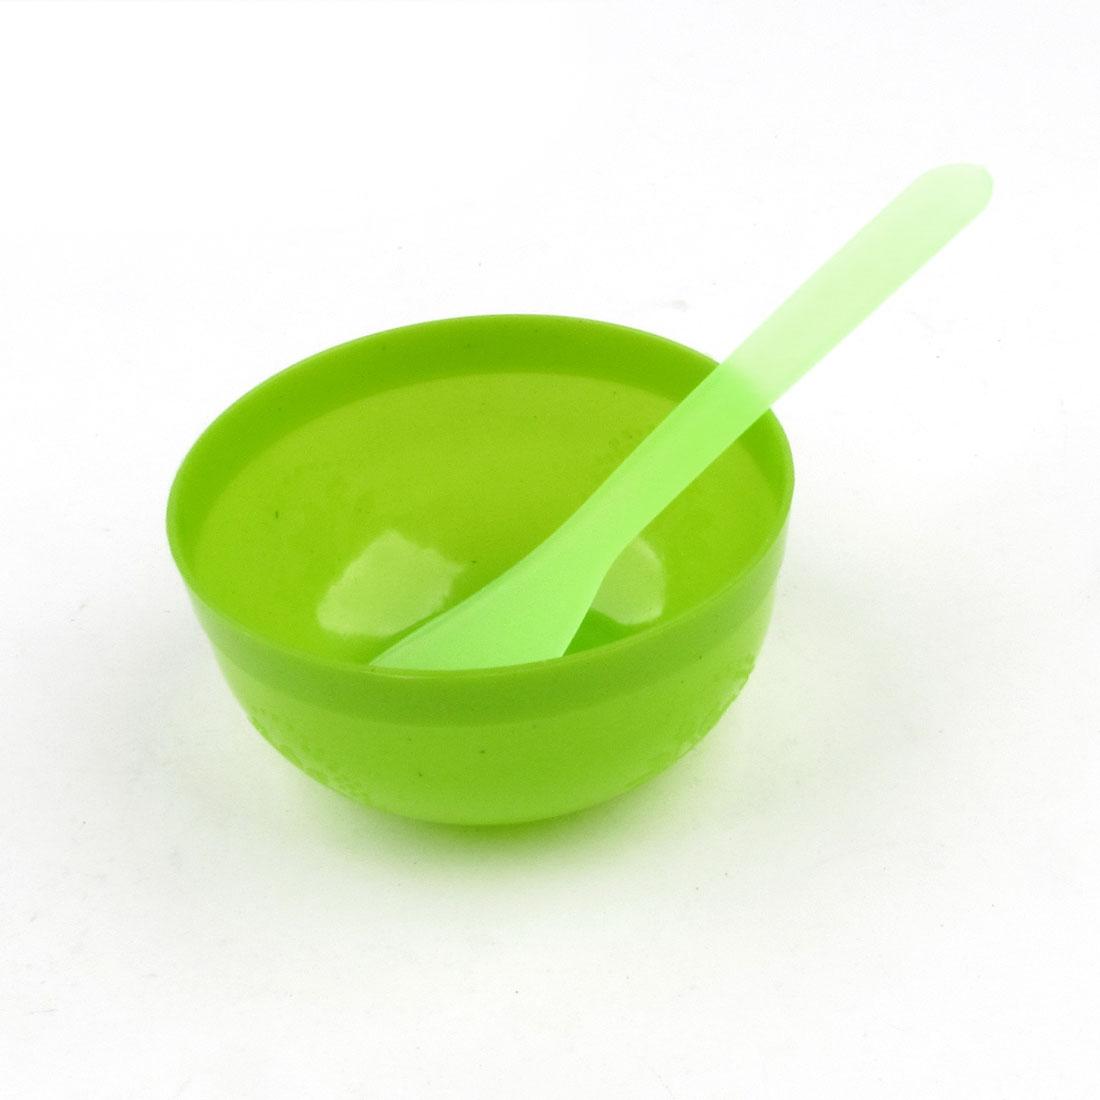 Green Plastic Makeup Tool Facial Mask Mixing Bowl w Spatula